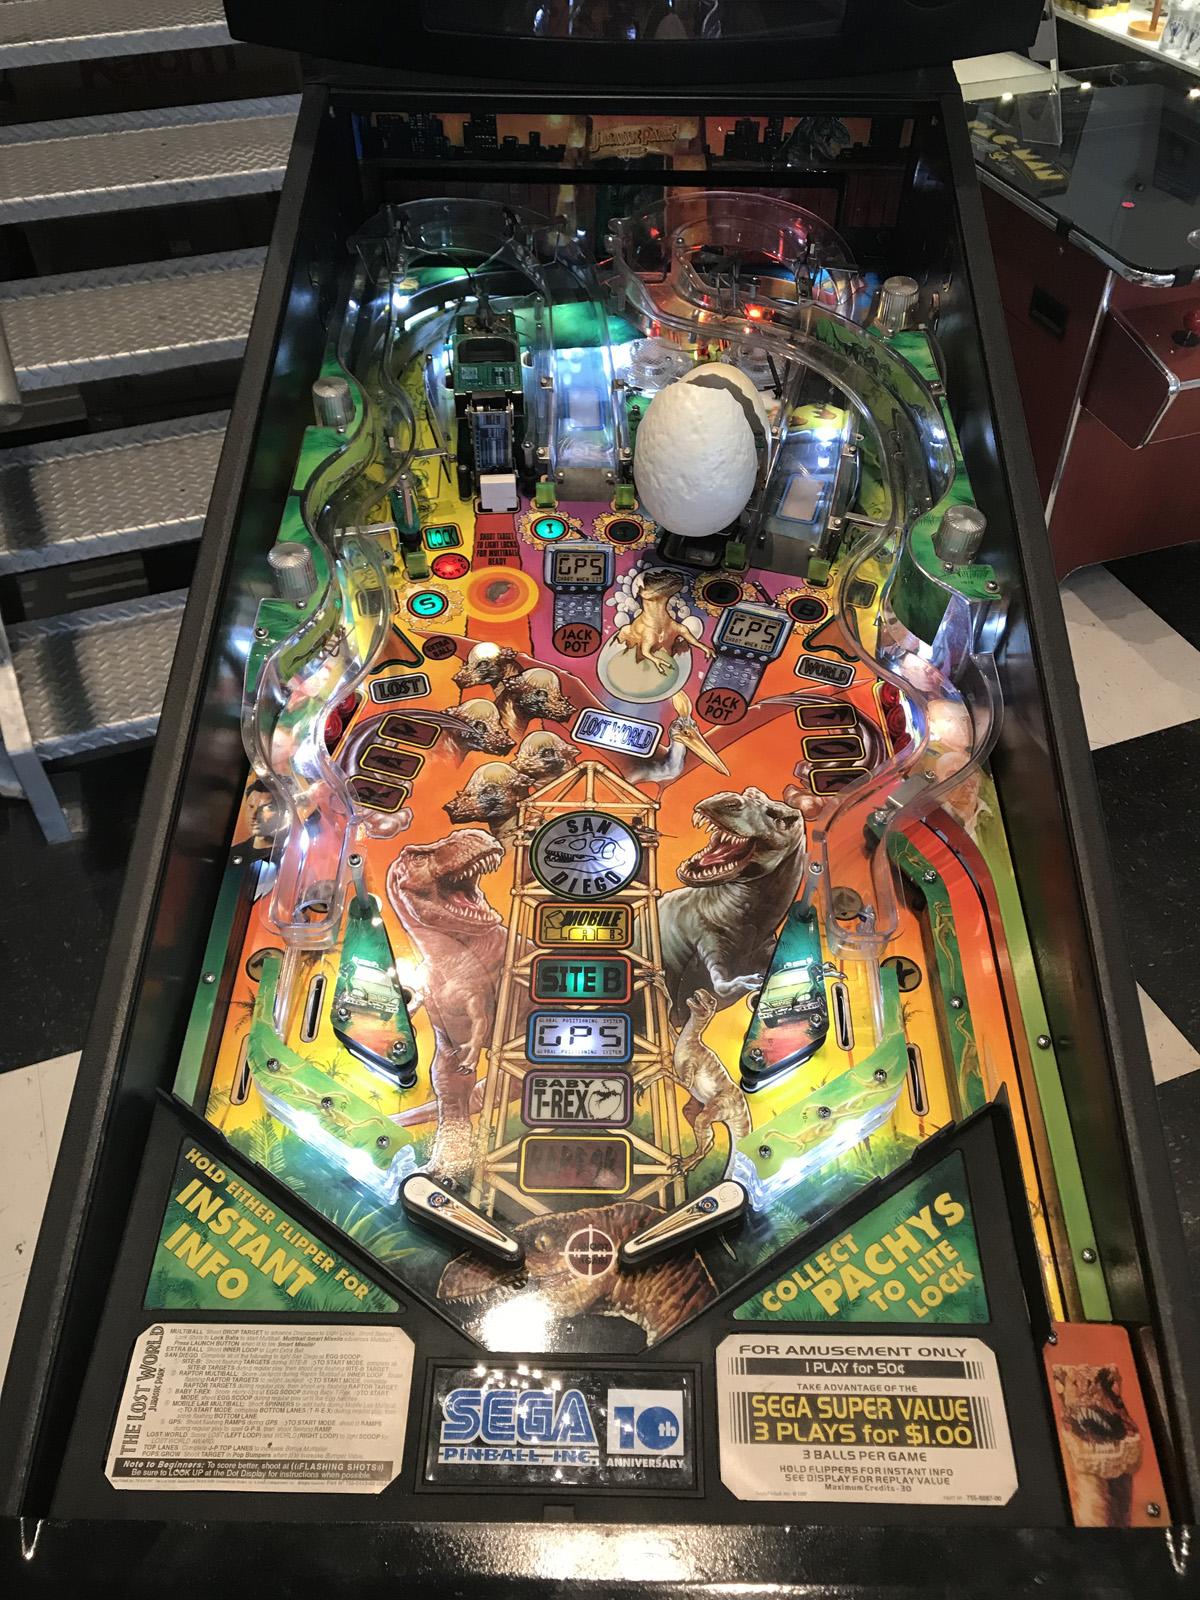 The Lost World: Jurassic Park Pinball Machine | Fun!